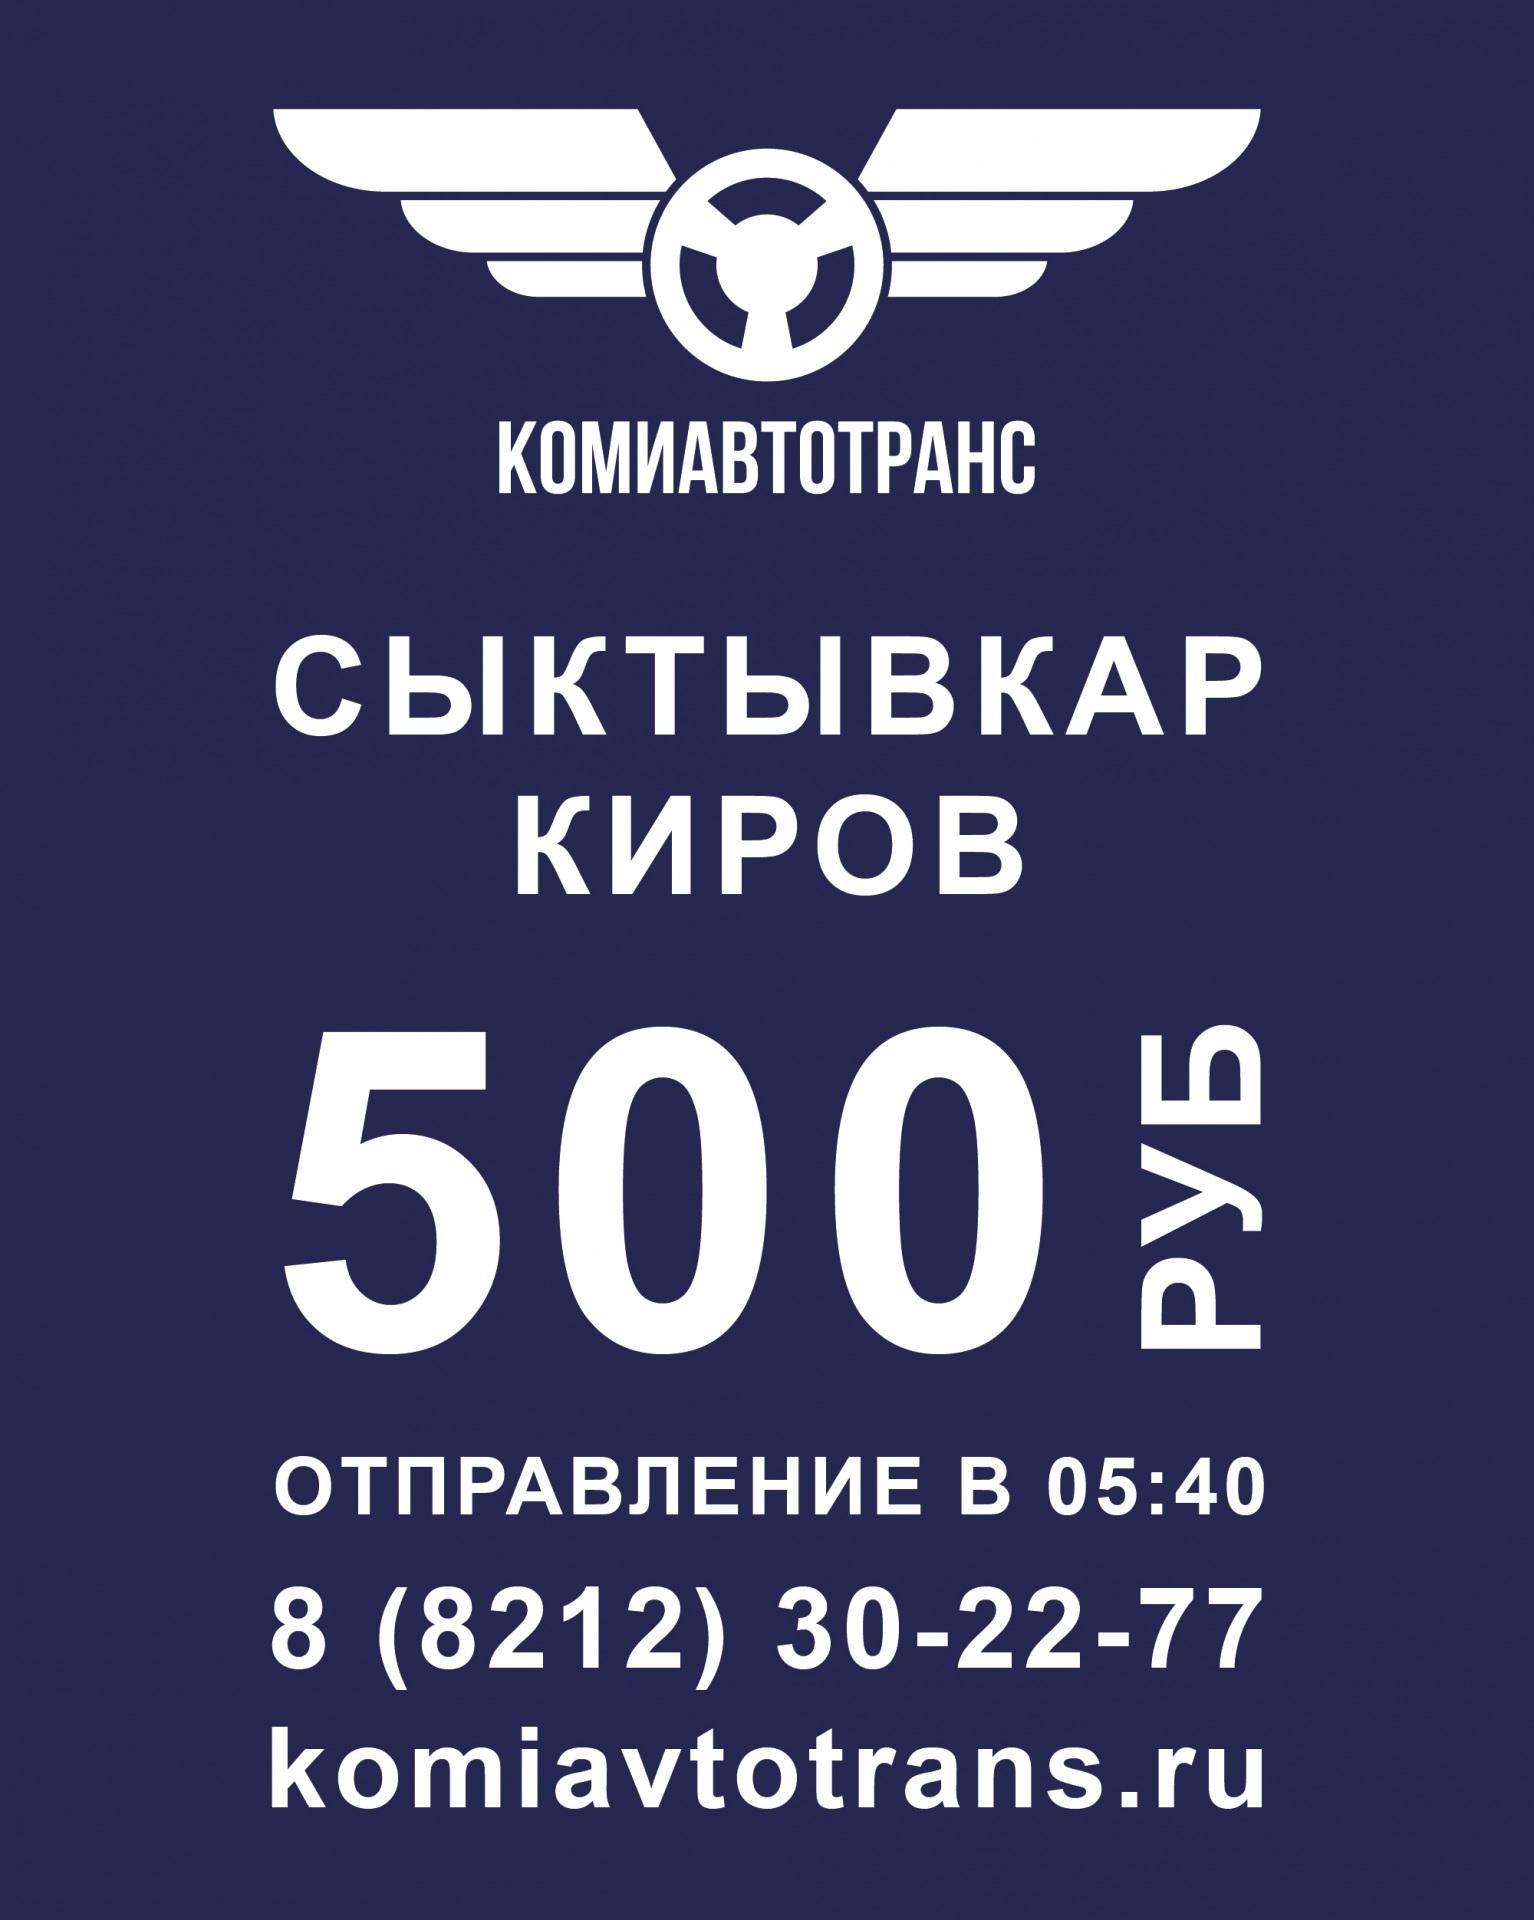 Maket-reklamy-reisa_Syk-Kirov-za-500-rubl-01.jpg